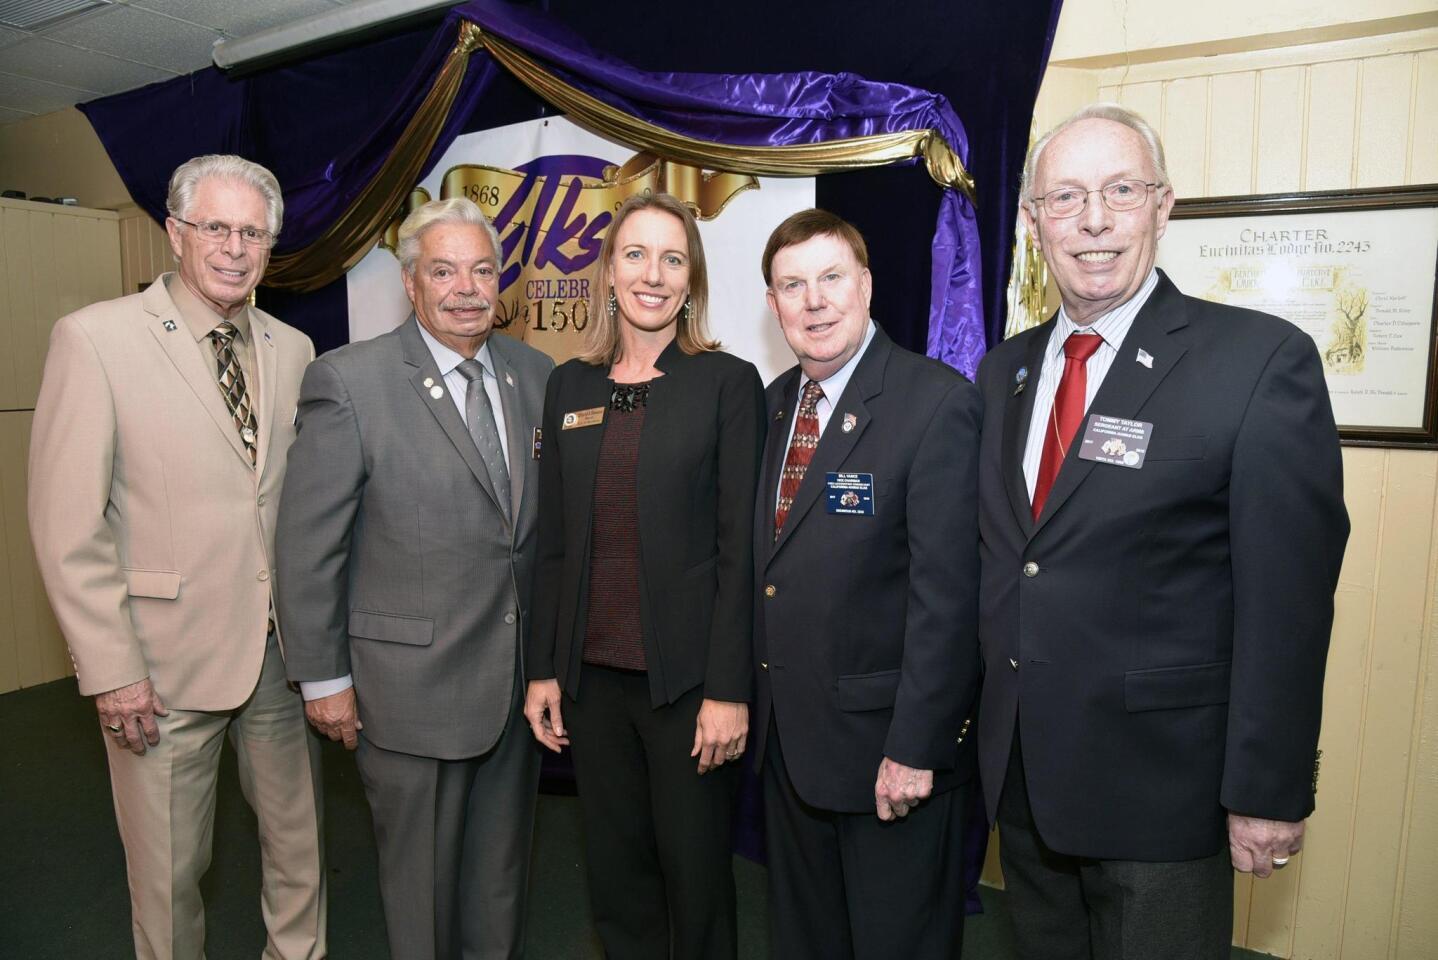 Encinitas Elks Lodge Celebrates 150 Years of Service